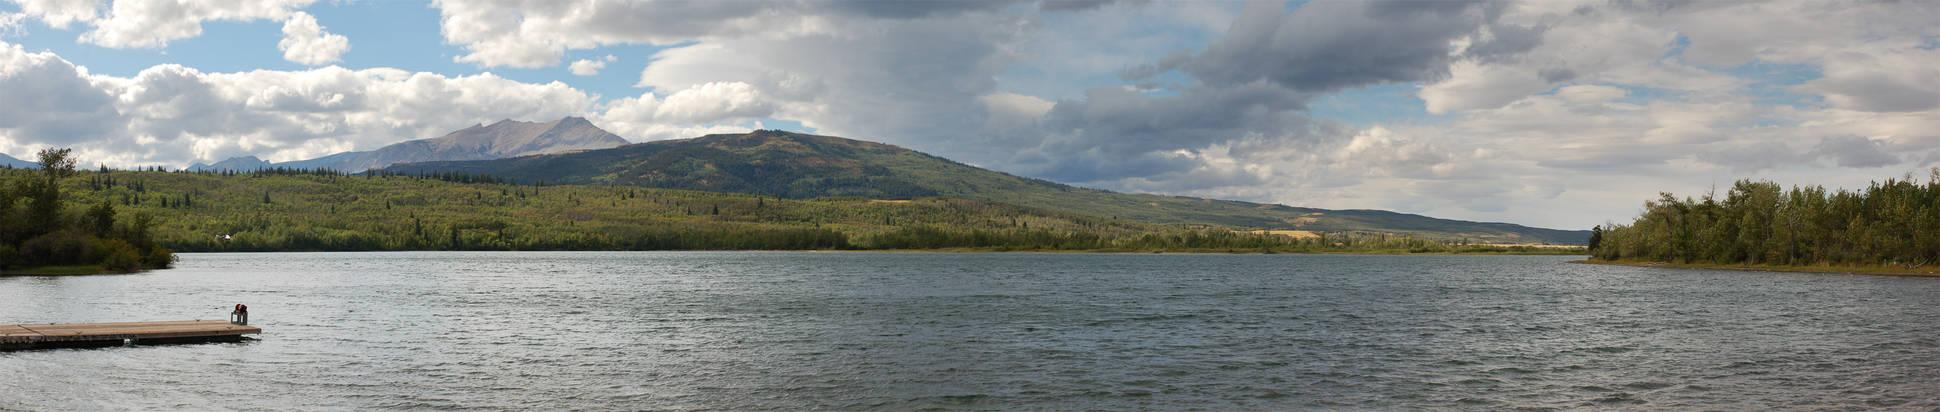 Lower Saint Mary Lake 2007-08-20